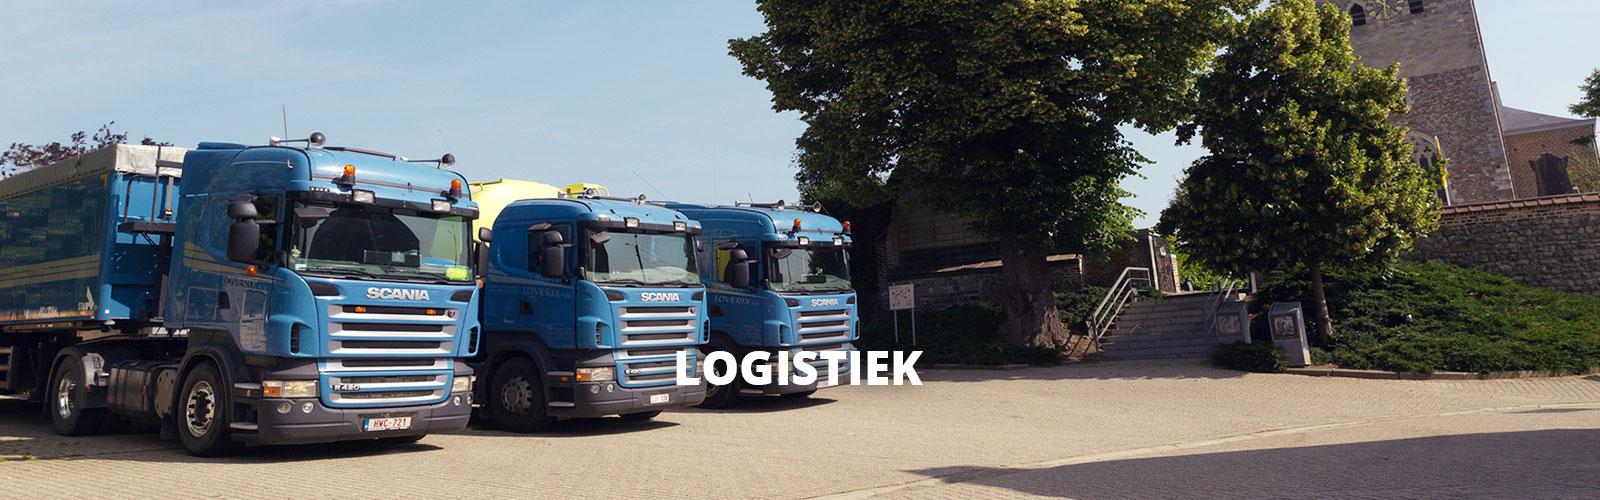 Logistiek-Header